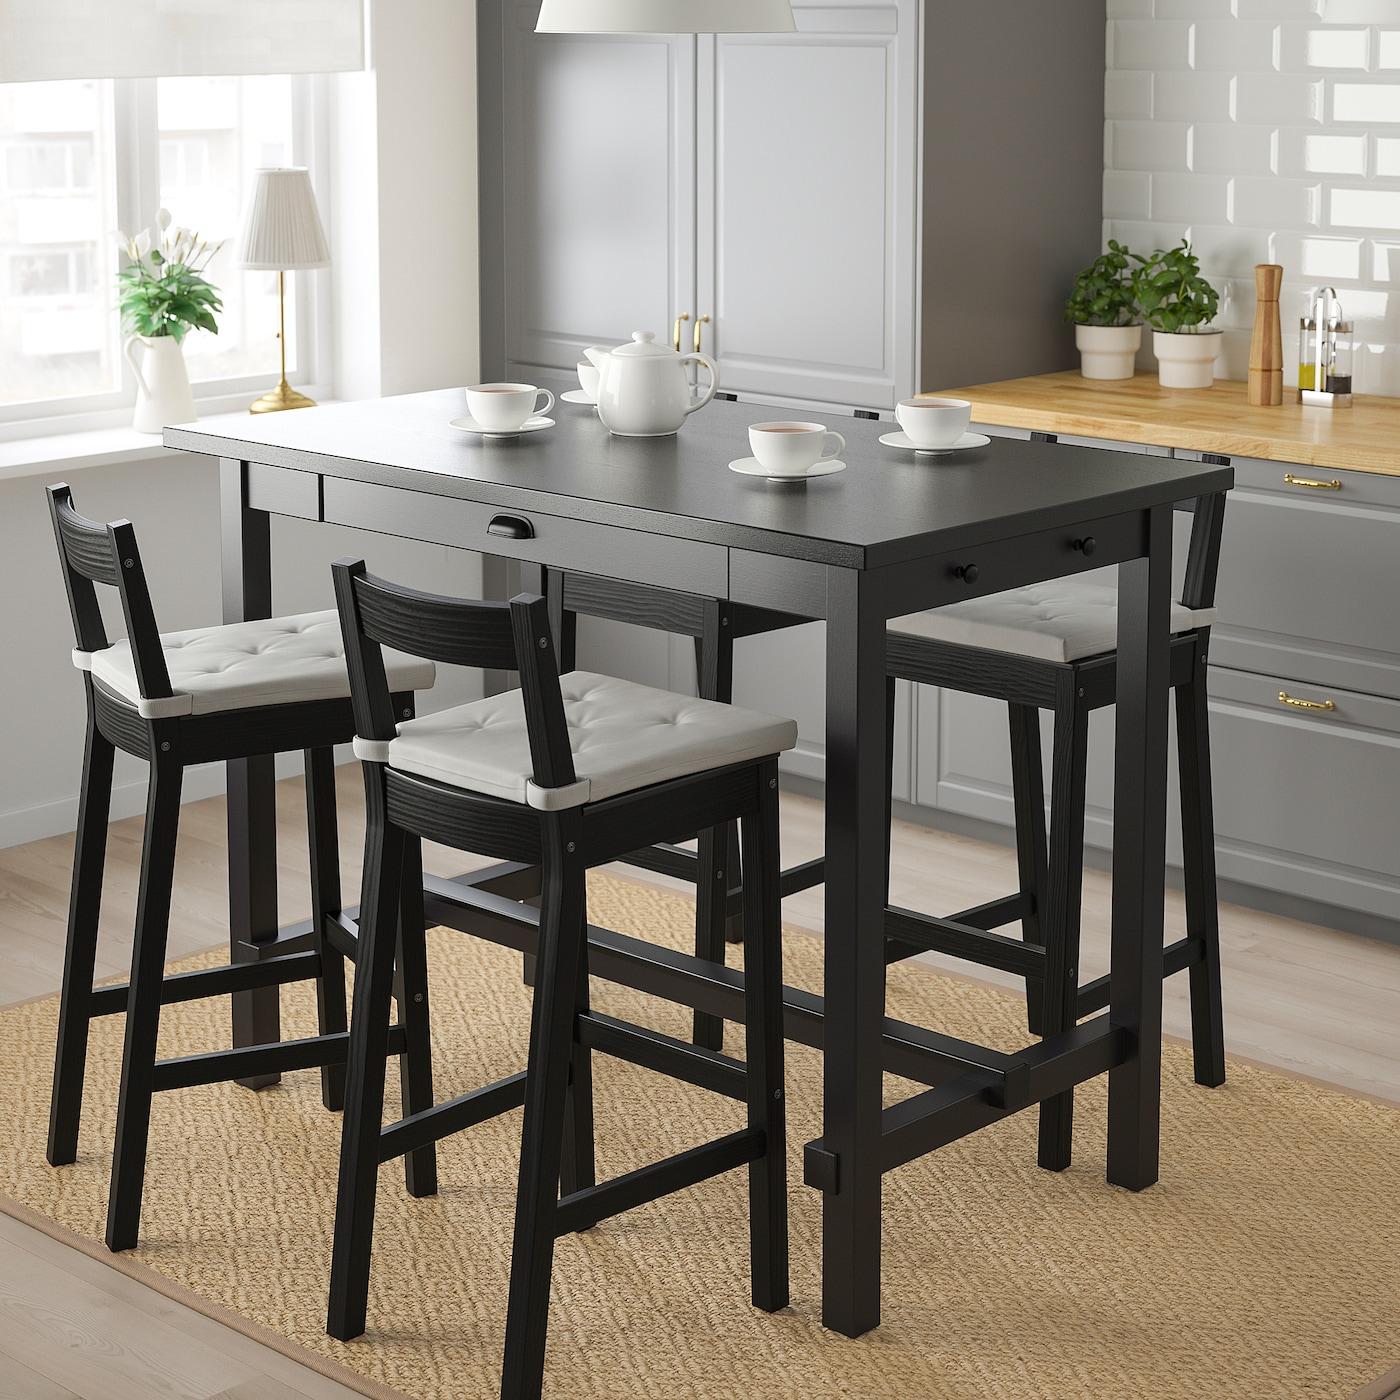 NORDVIKEN / NORDVIKEN Bar table and 9 bar stools   black/black